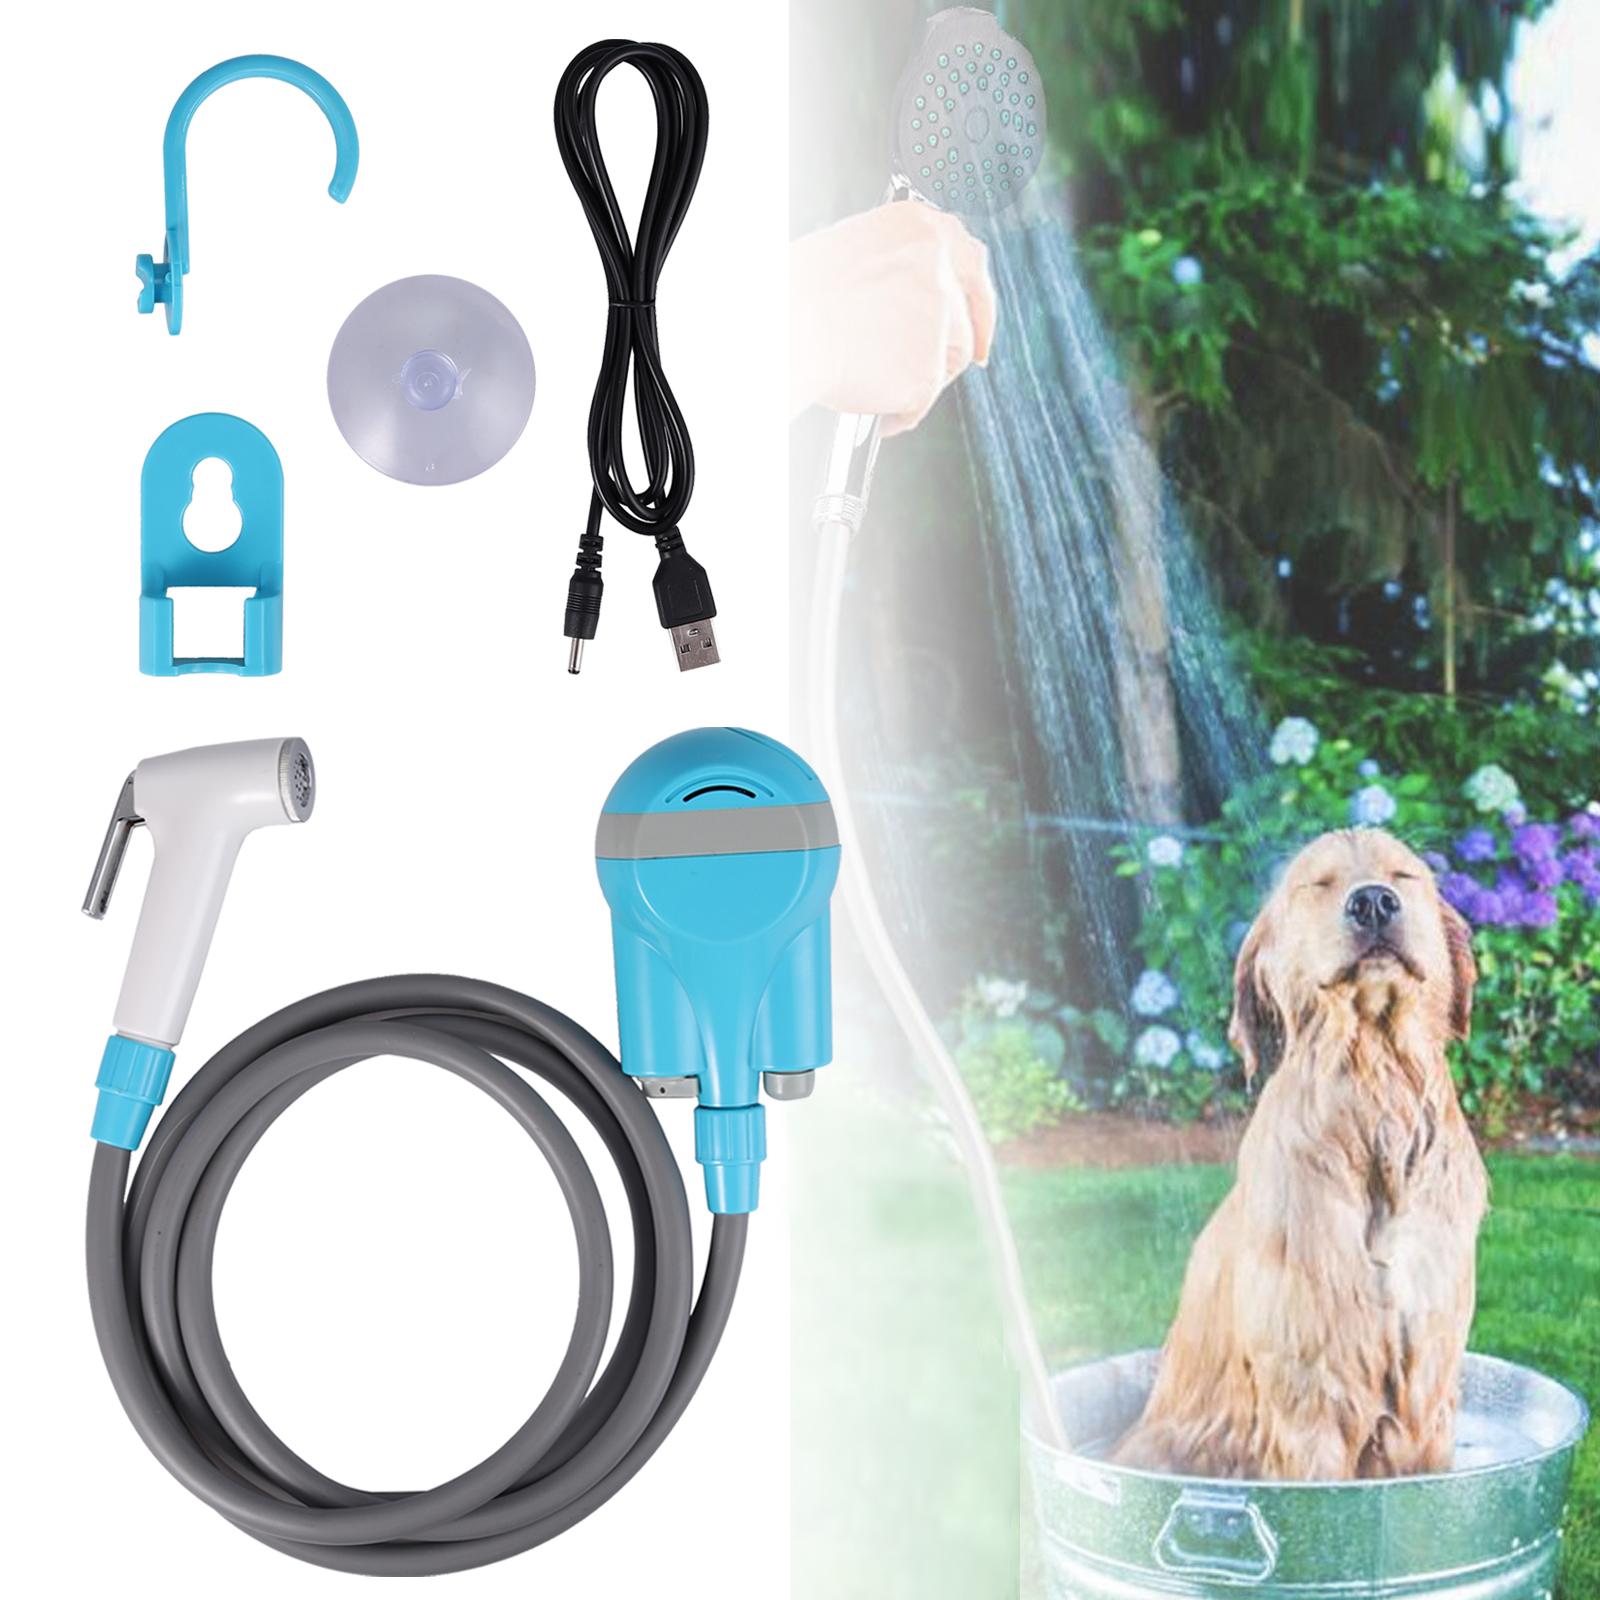 USB Charge Portable Outdoor Shower Handheld Kit Festival Caravan Camping Bathing